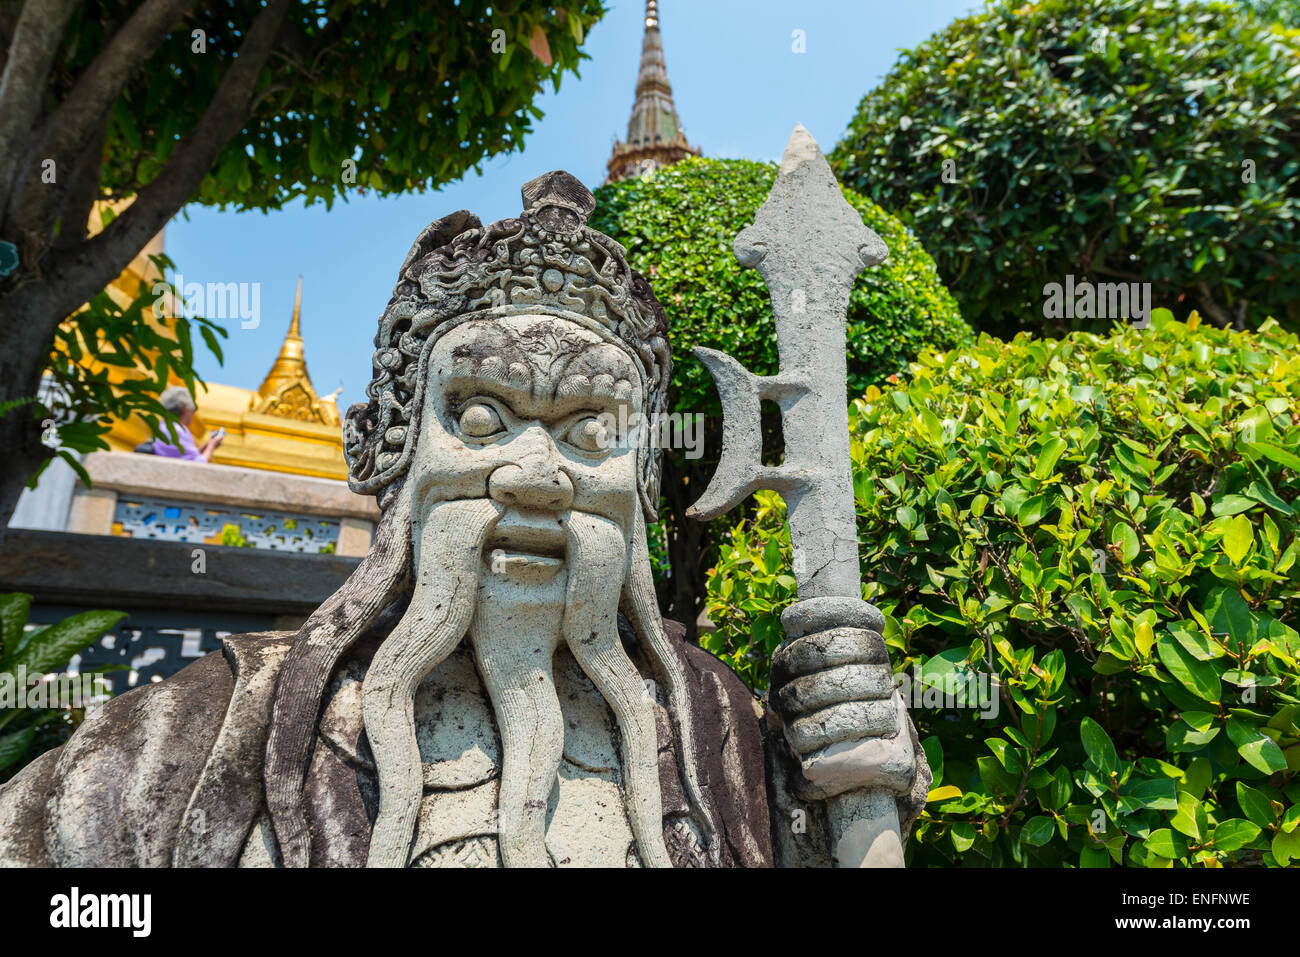 Fearsome stone palace guard, Chinese statue, Royal Palace, Bangkok, Thailand - Stock Image